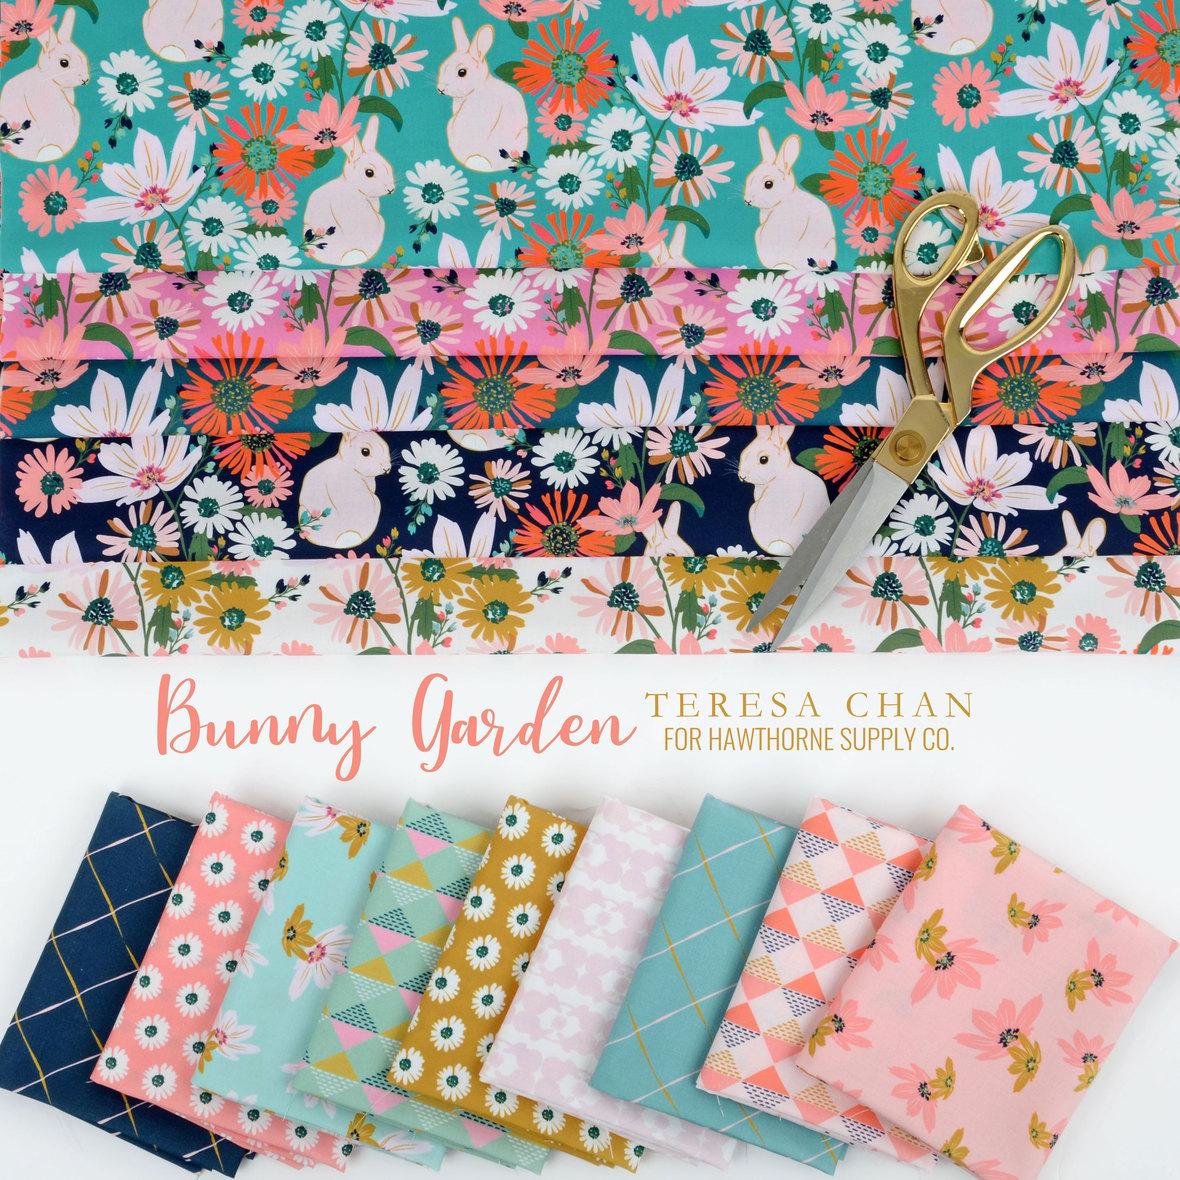 Bunny-Garden-Teresa-Chan-for-Hawthorne-Supply-Co